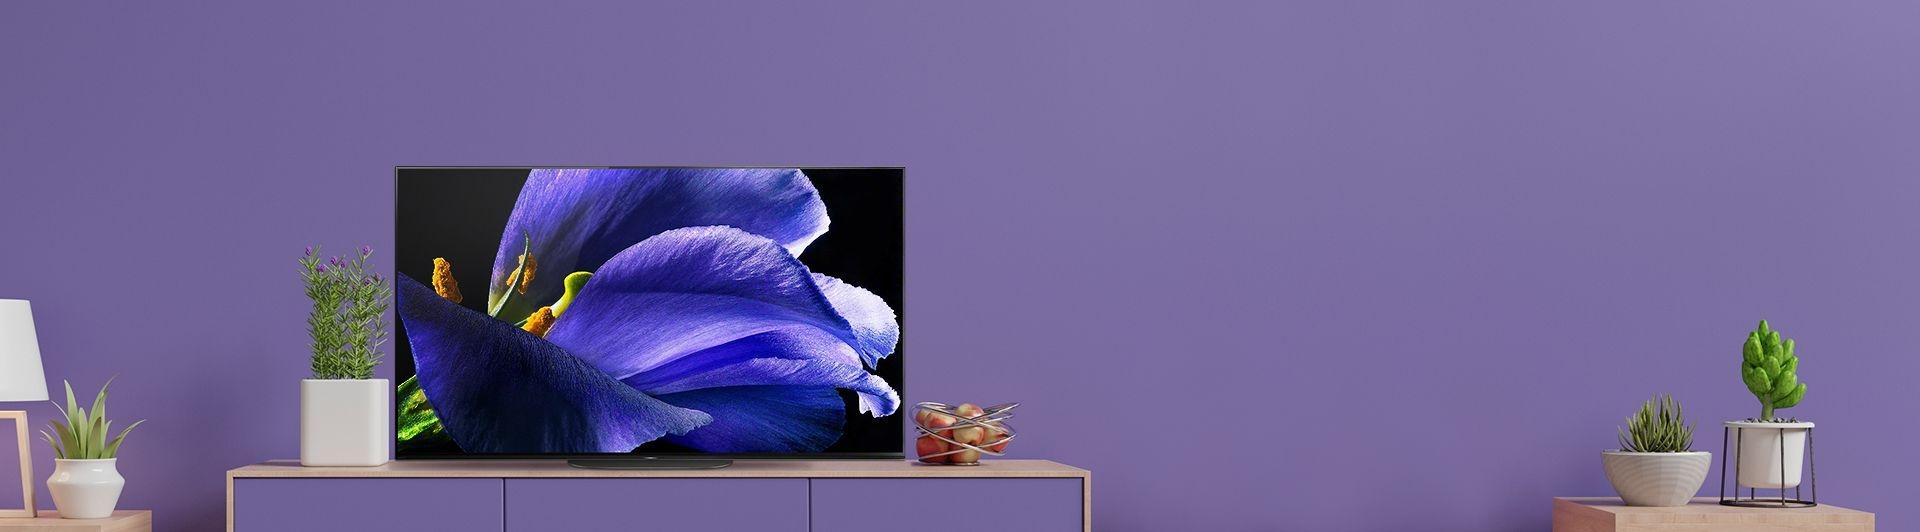 Smart Tivi OLED Sony 4K 55 inch KD-55A9G